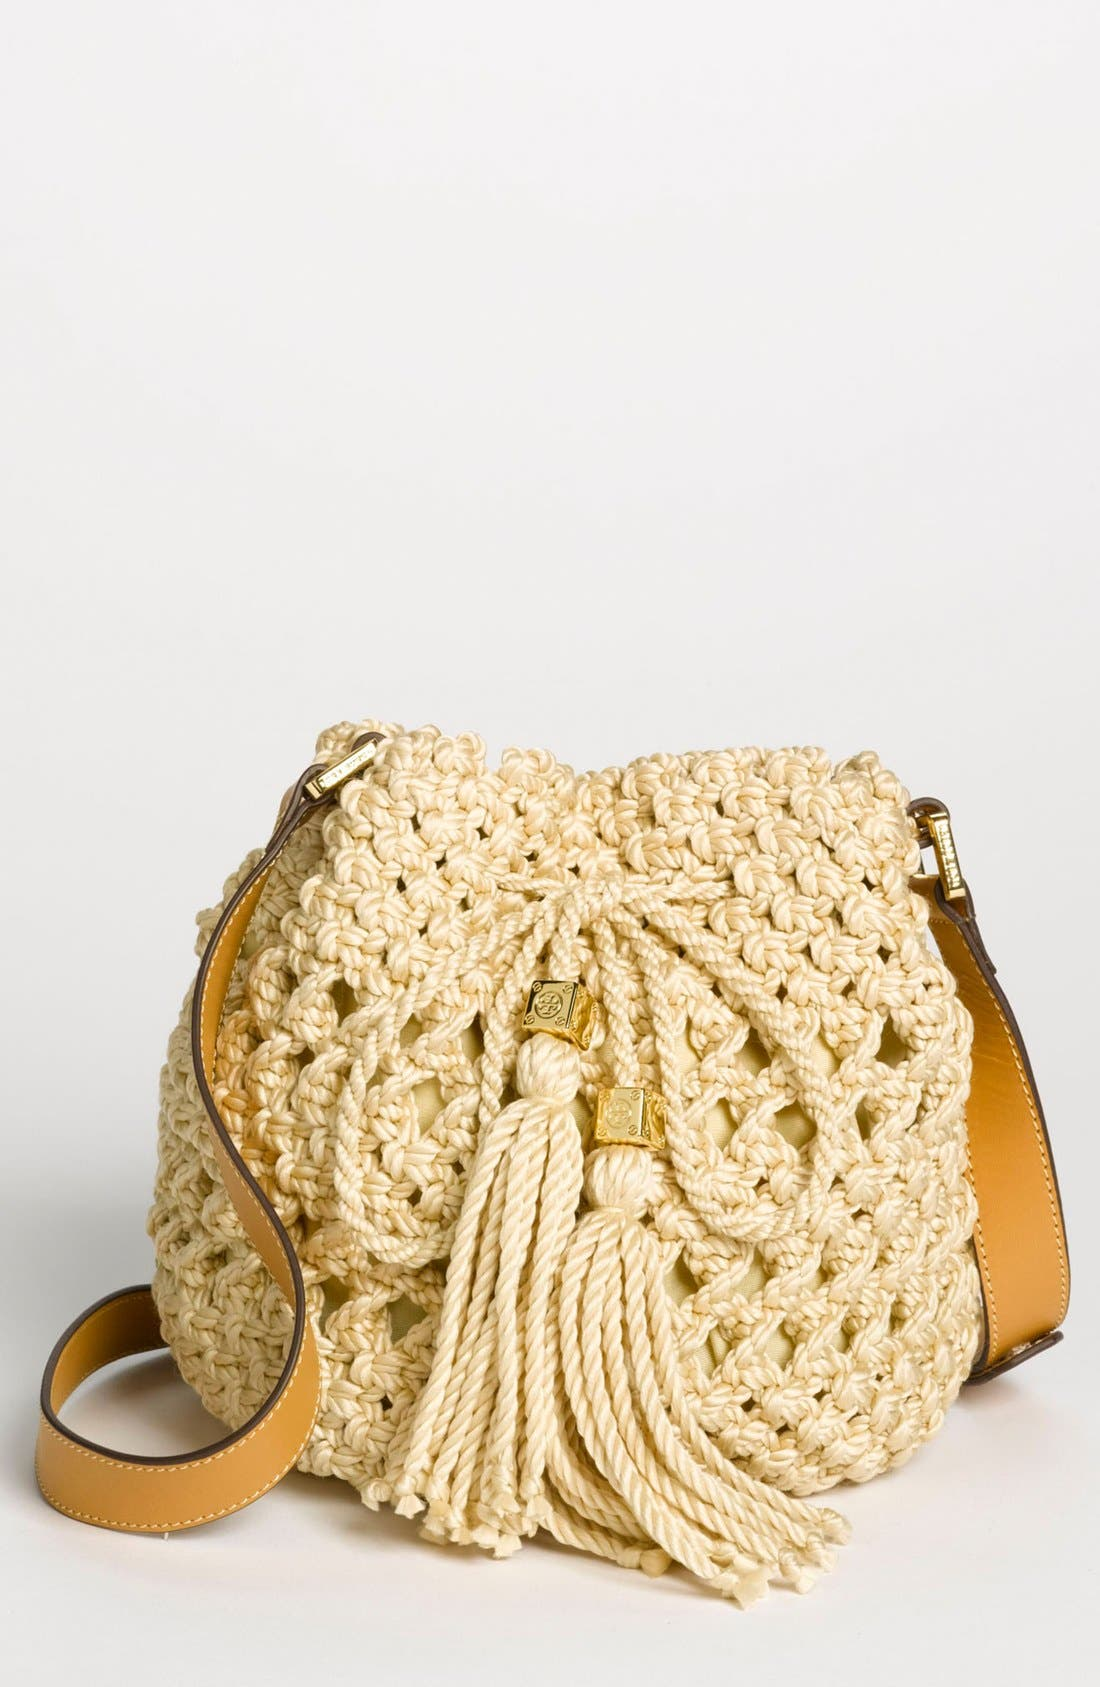 Main Image - Tory Burch 'Dawson - Small' Crocheted Bucket Bag